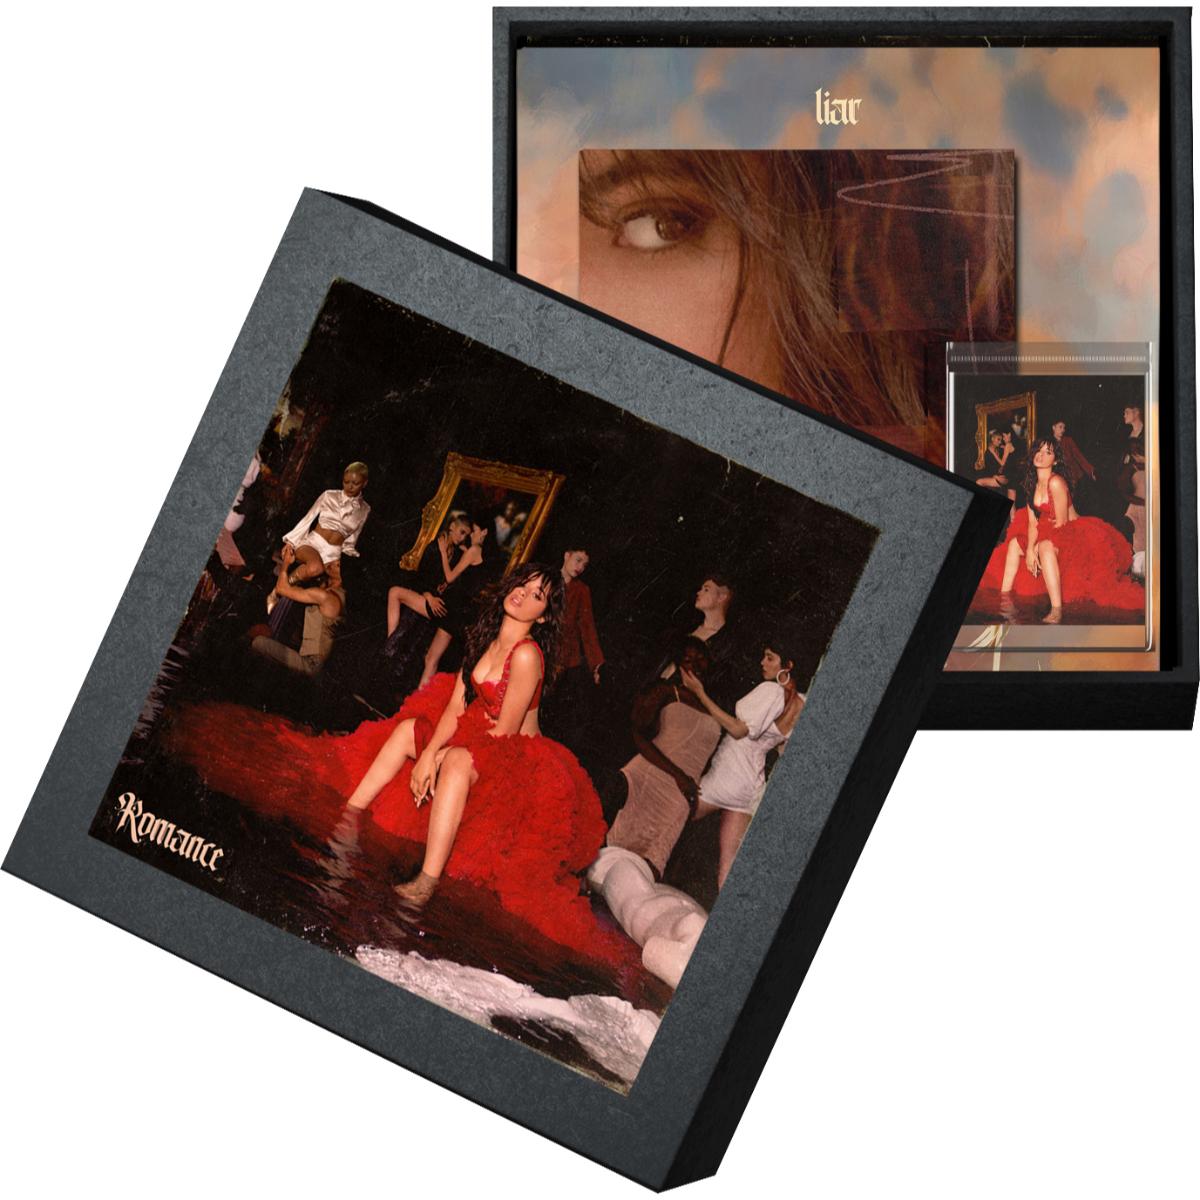 Romance Super Deluxe Vinyl Box Set + Digital Album Download